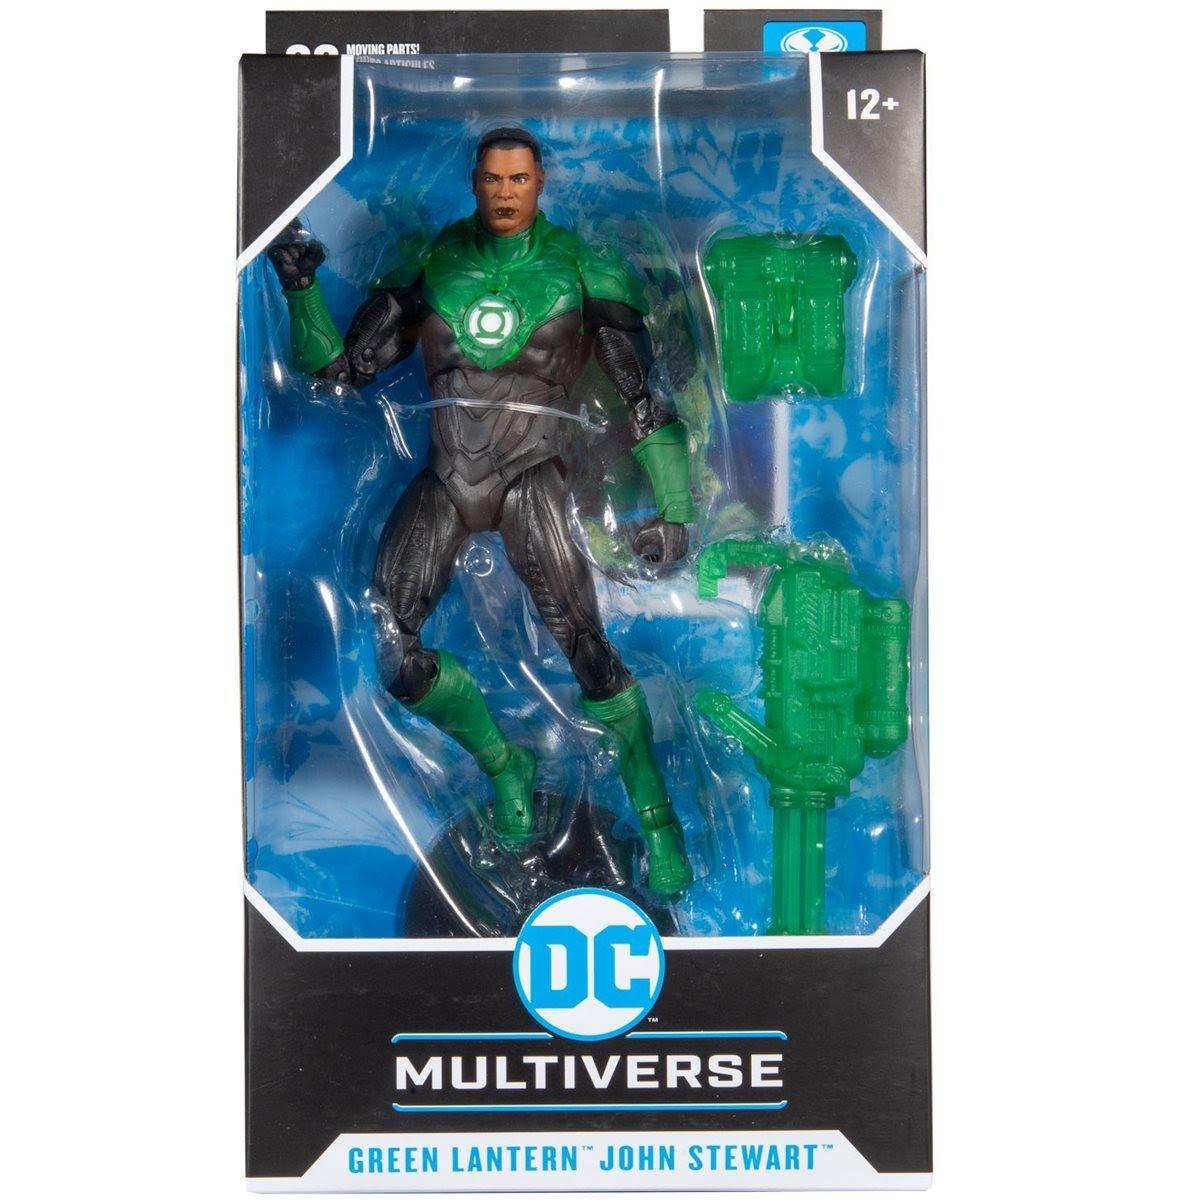 Green Lantern John Stewart - DC Multiverse